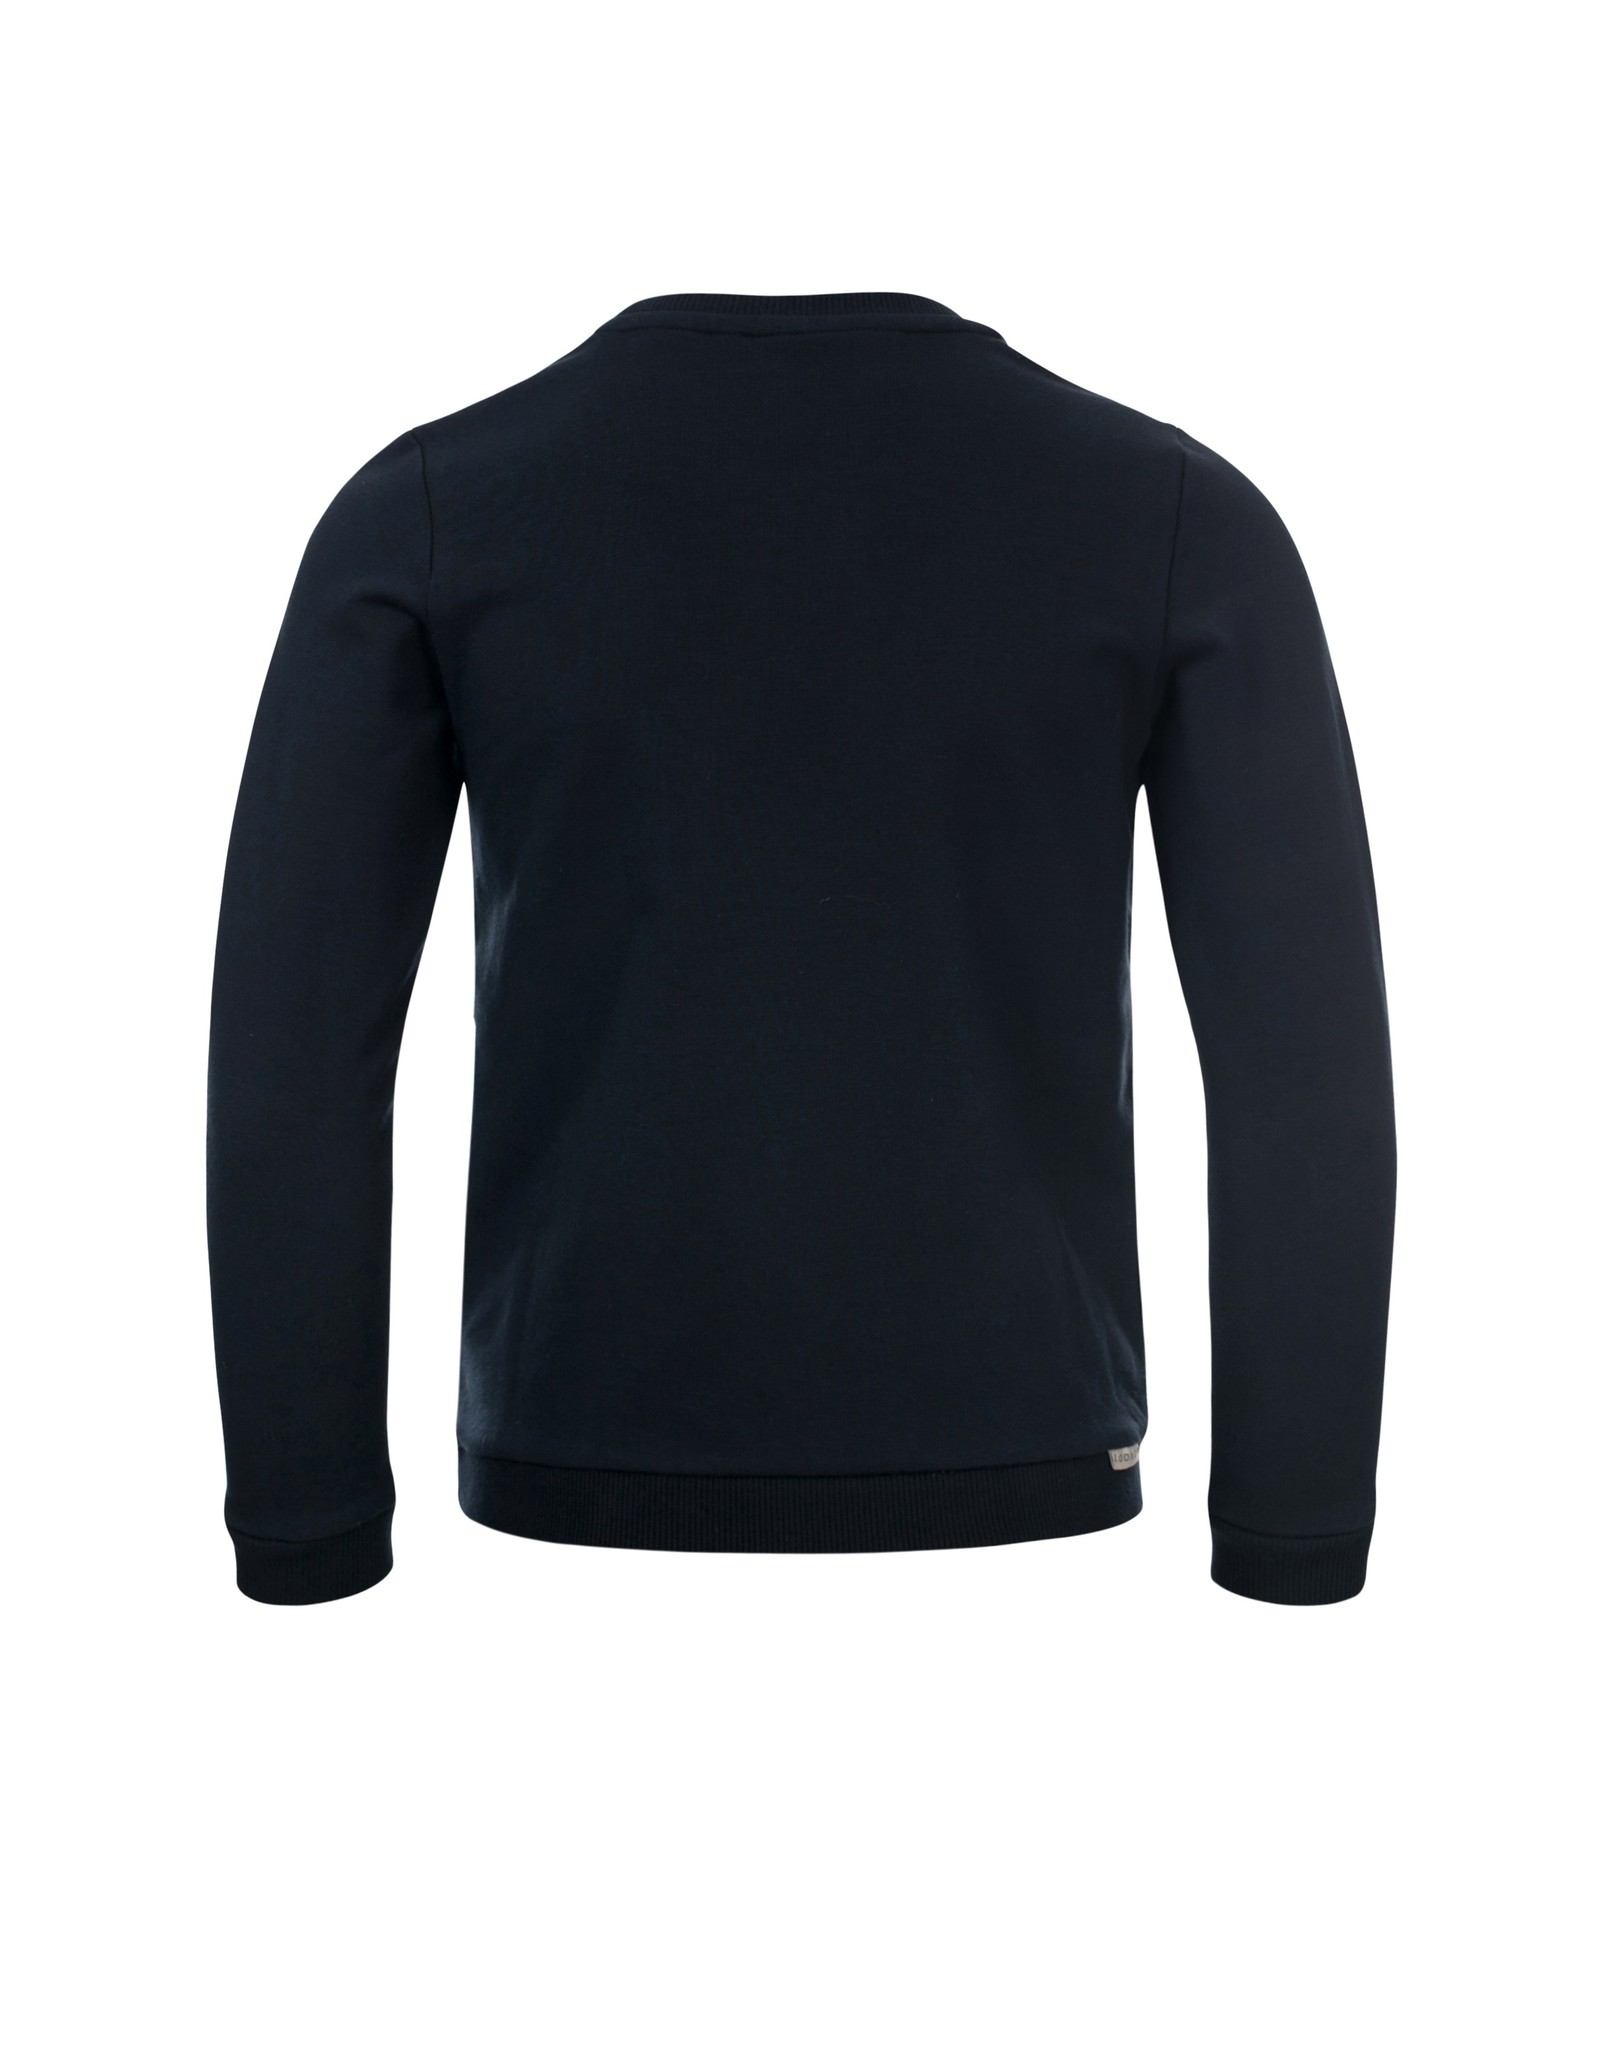 Looxs Little Little sweater navy maat 128